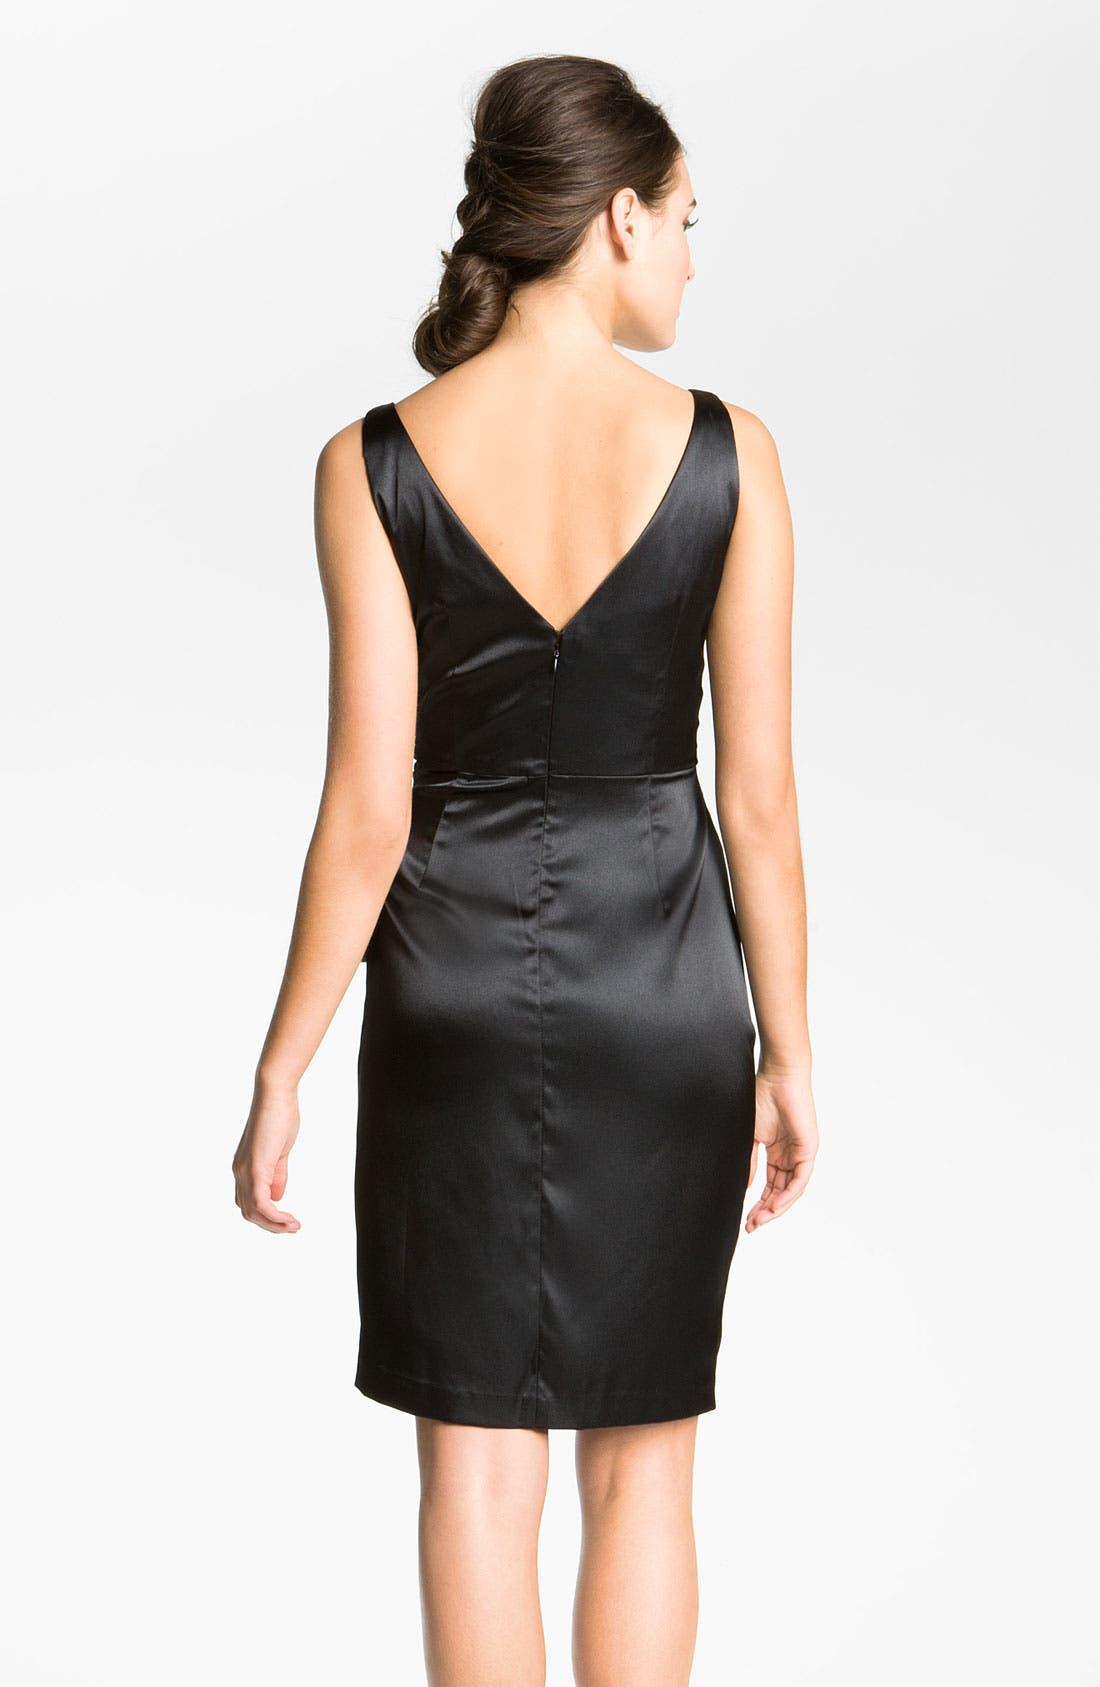 MAGGY LONDON, Side Bow Stretch Satin Sheath Dress, Alternate thumbnail 3, color, 001